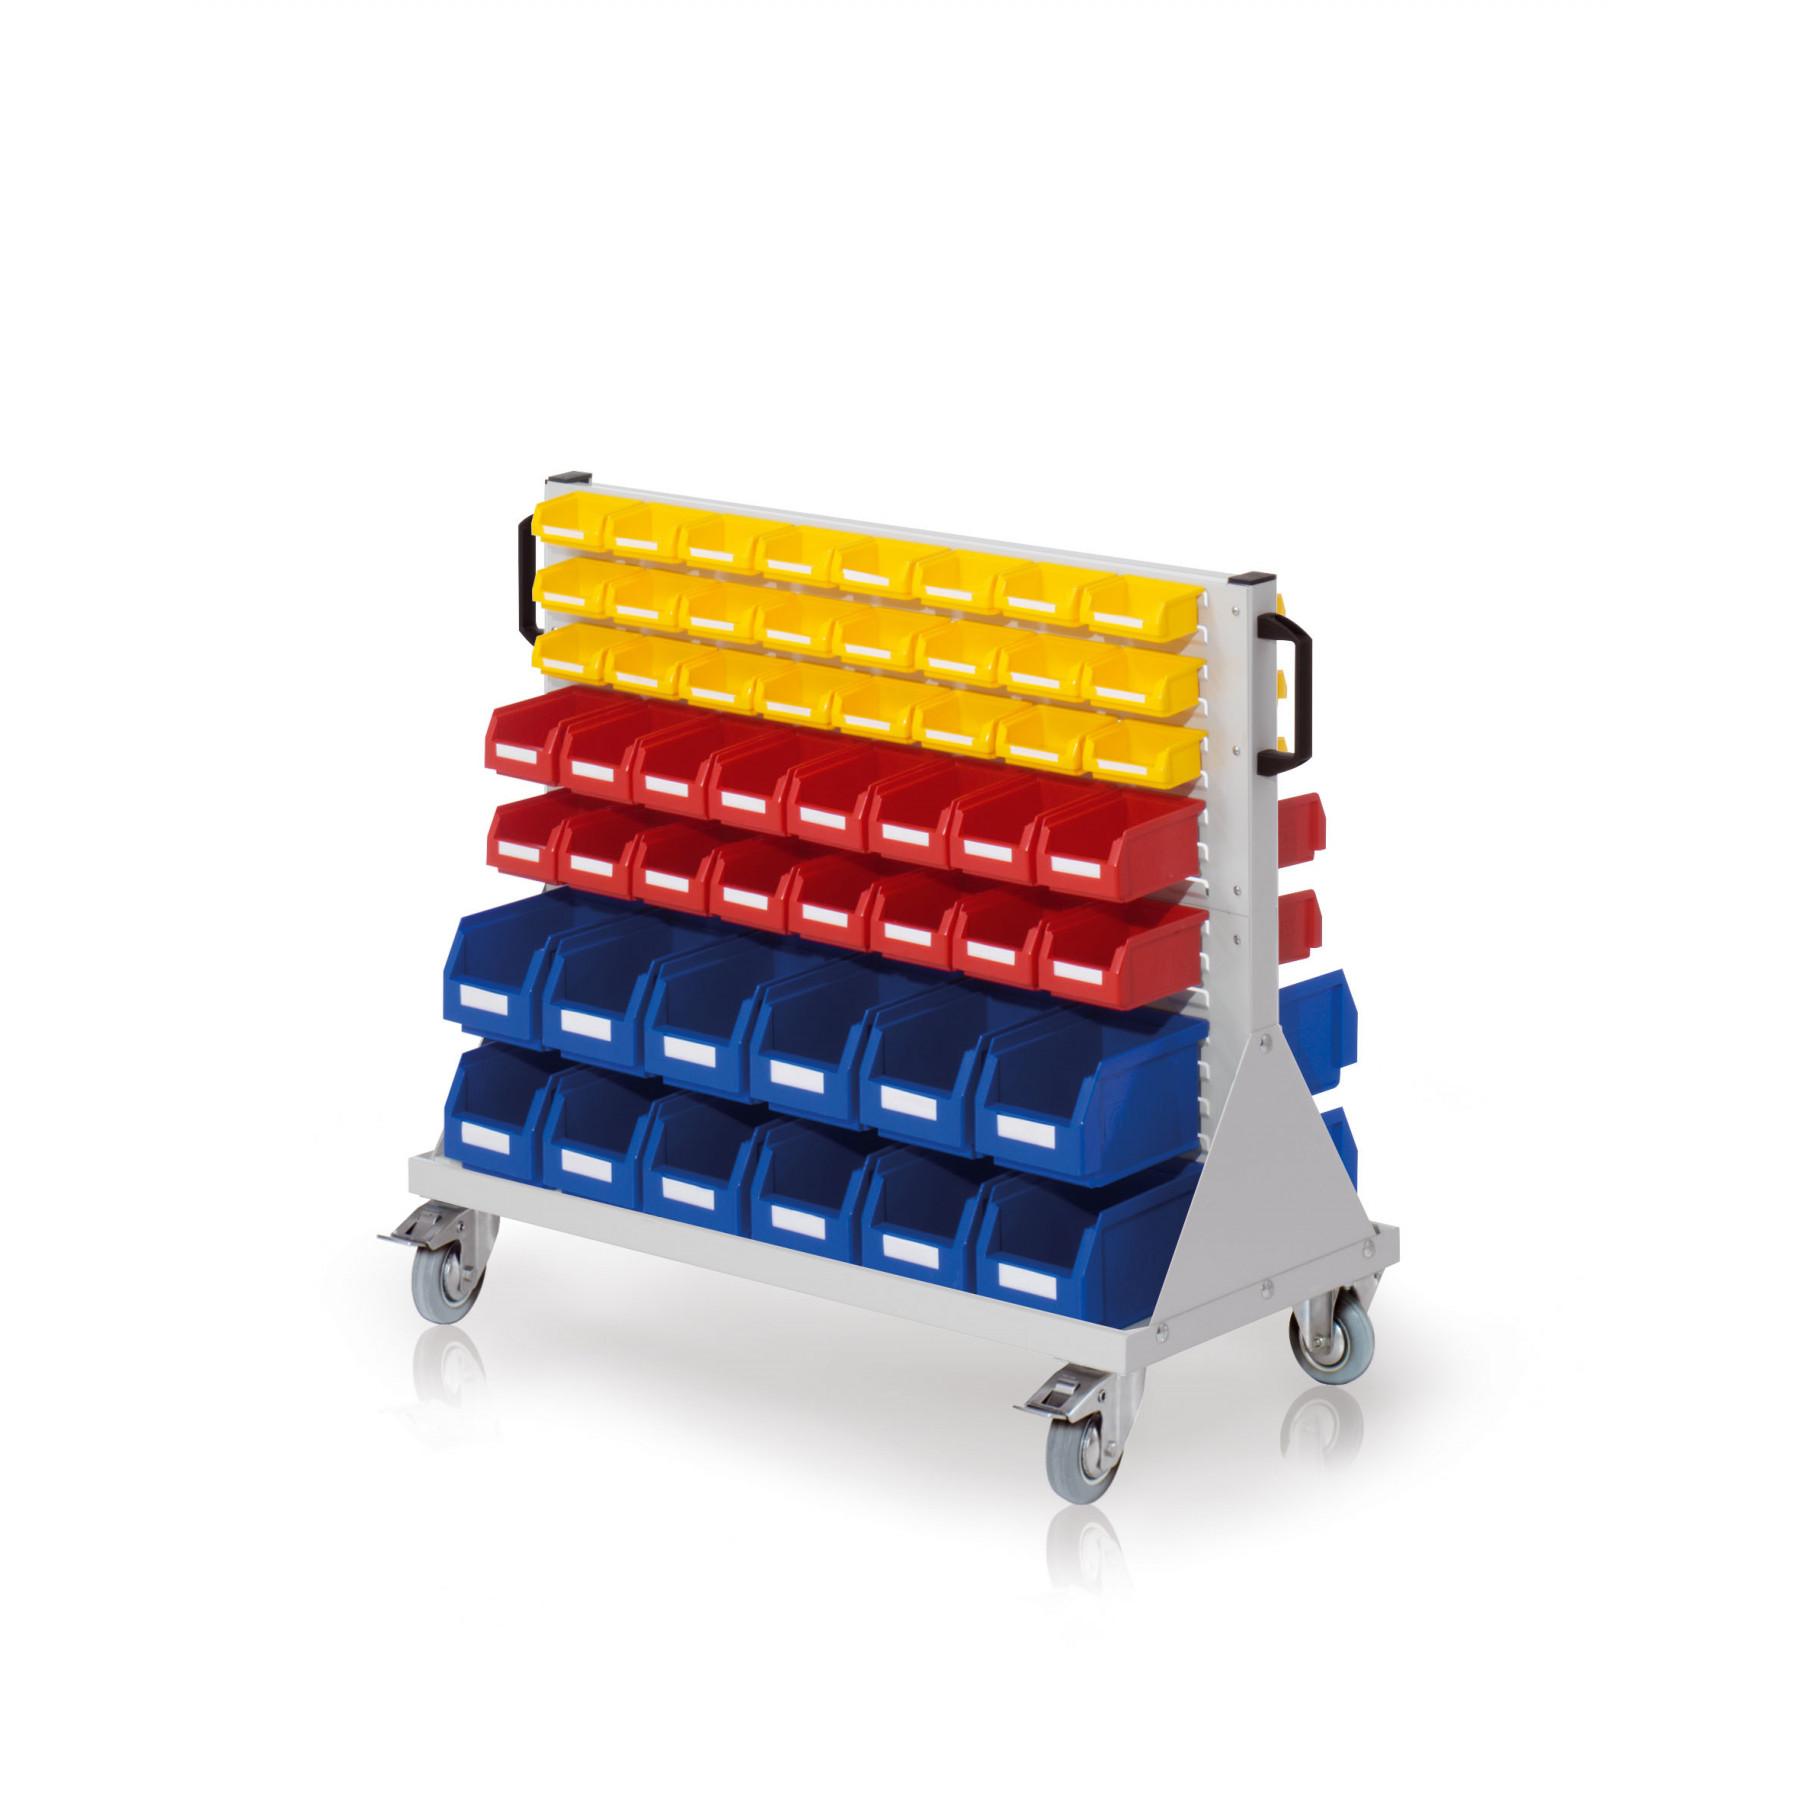 RasterMobil® rijdende bakkenstelling 1000x500x890 mm (LxBxH) 7020.04.0913